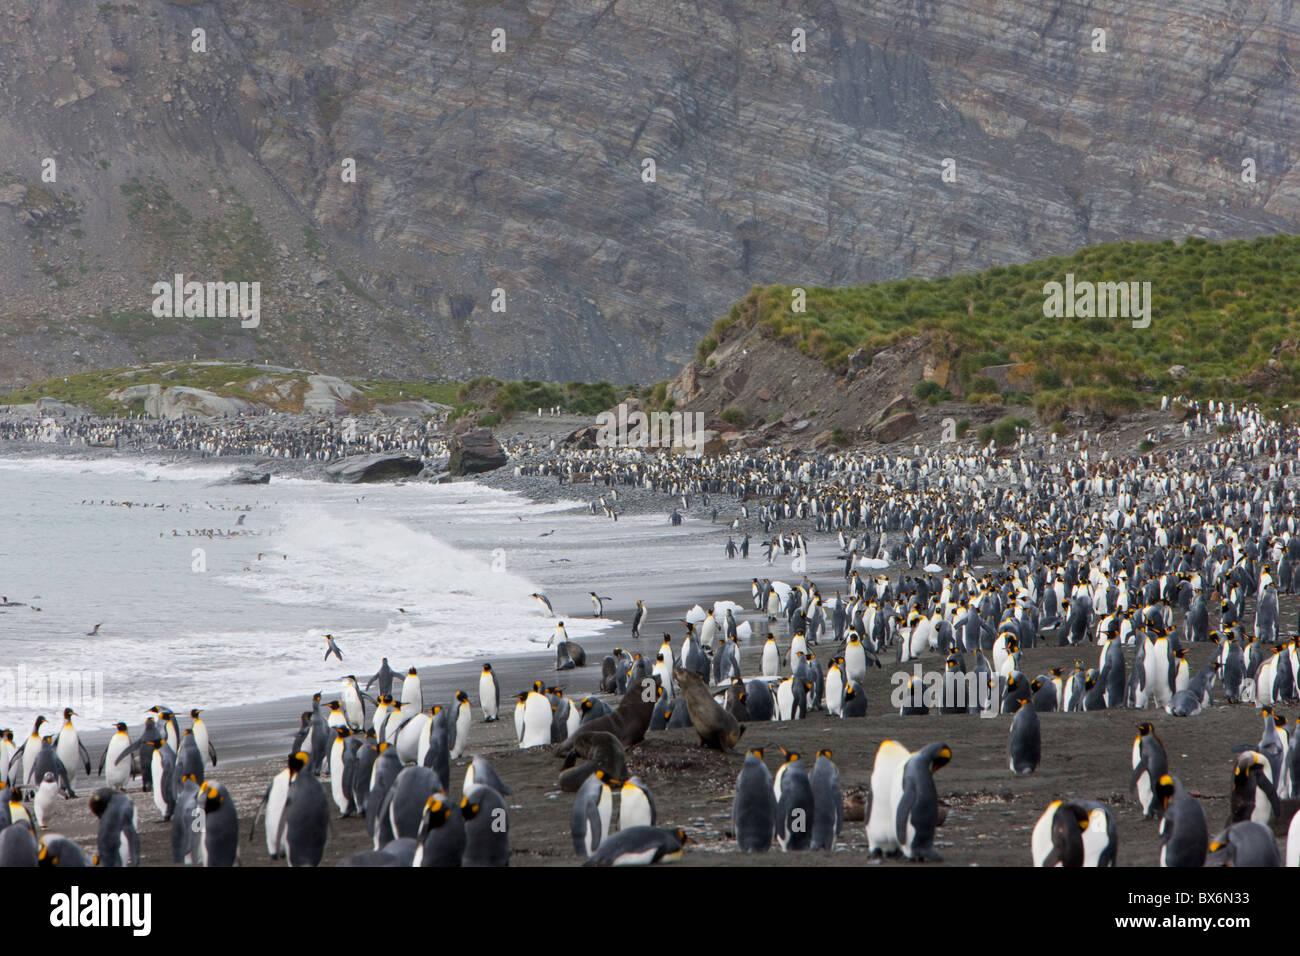 Colony of king penguins (Aptenodytes patagonicus), Gold Harbour, South Georgia, Antarctic, Polar Regions - Stock Image